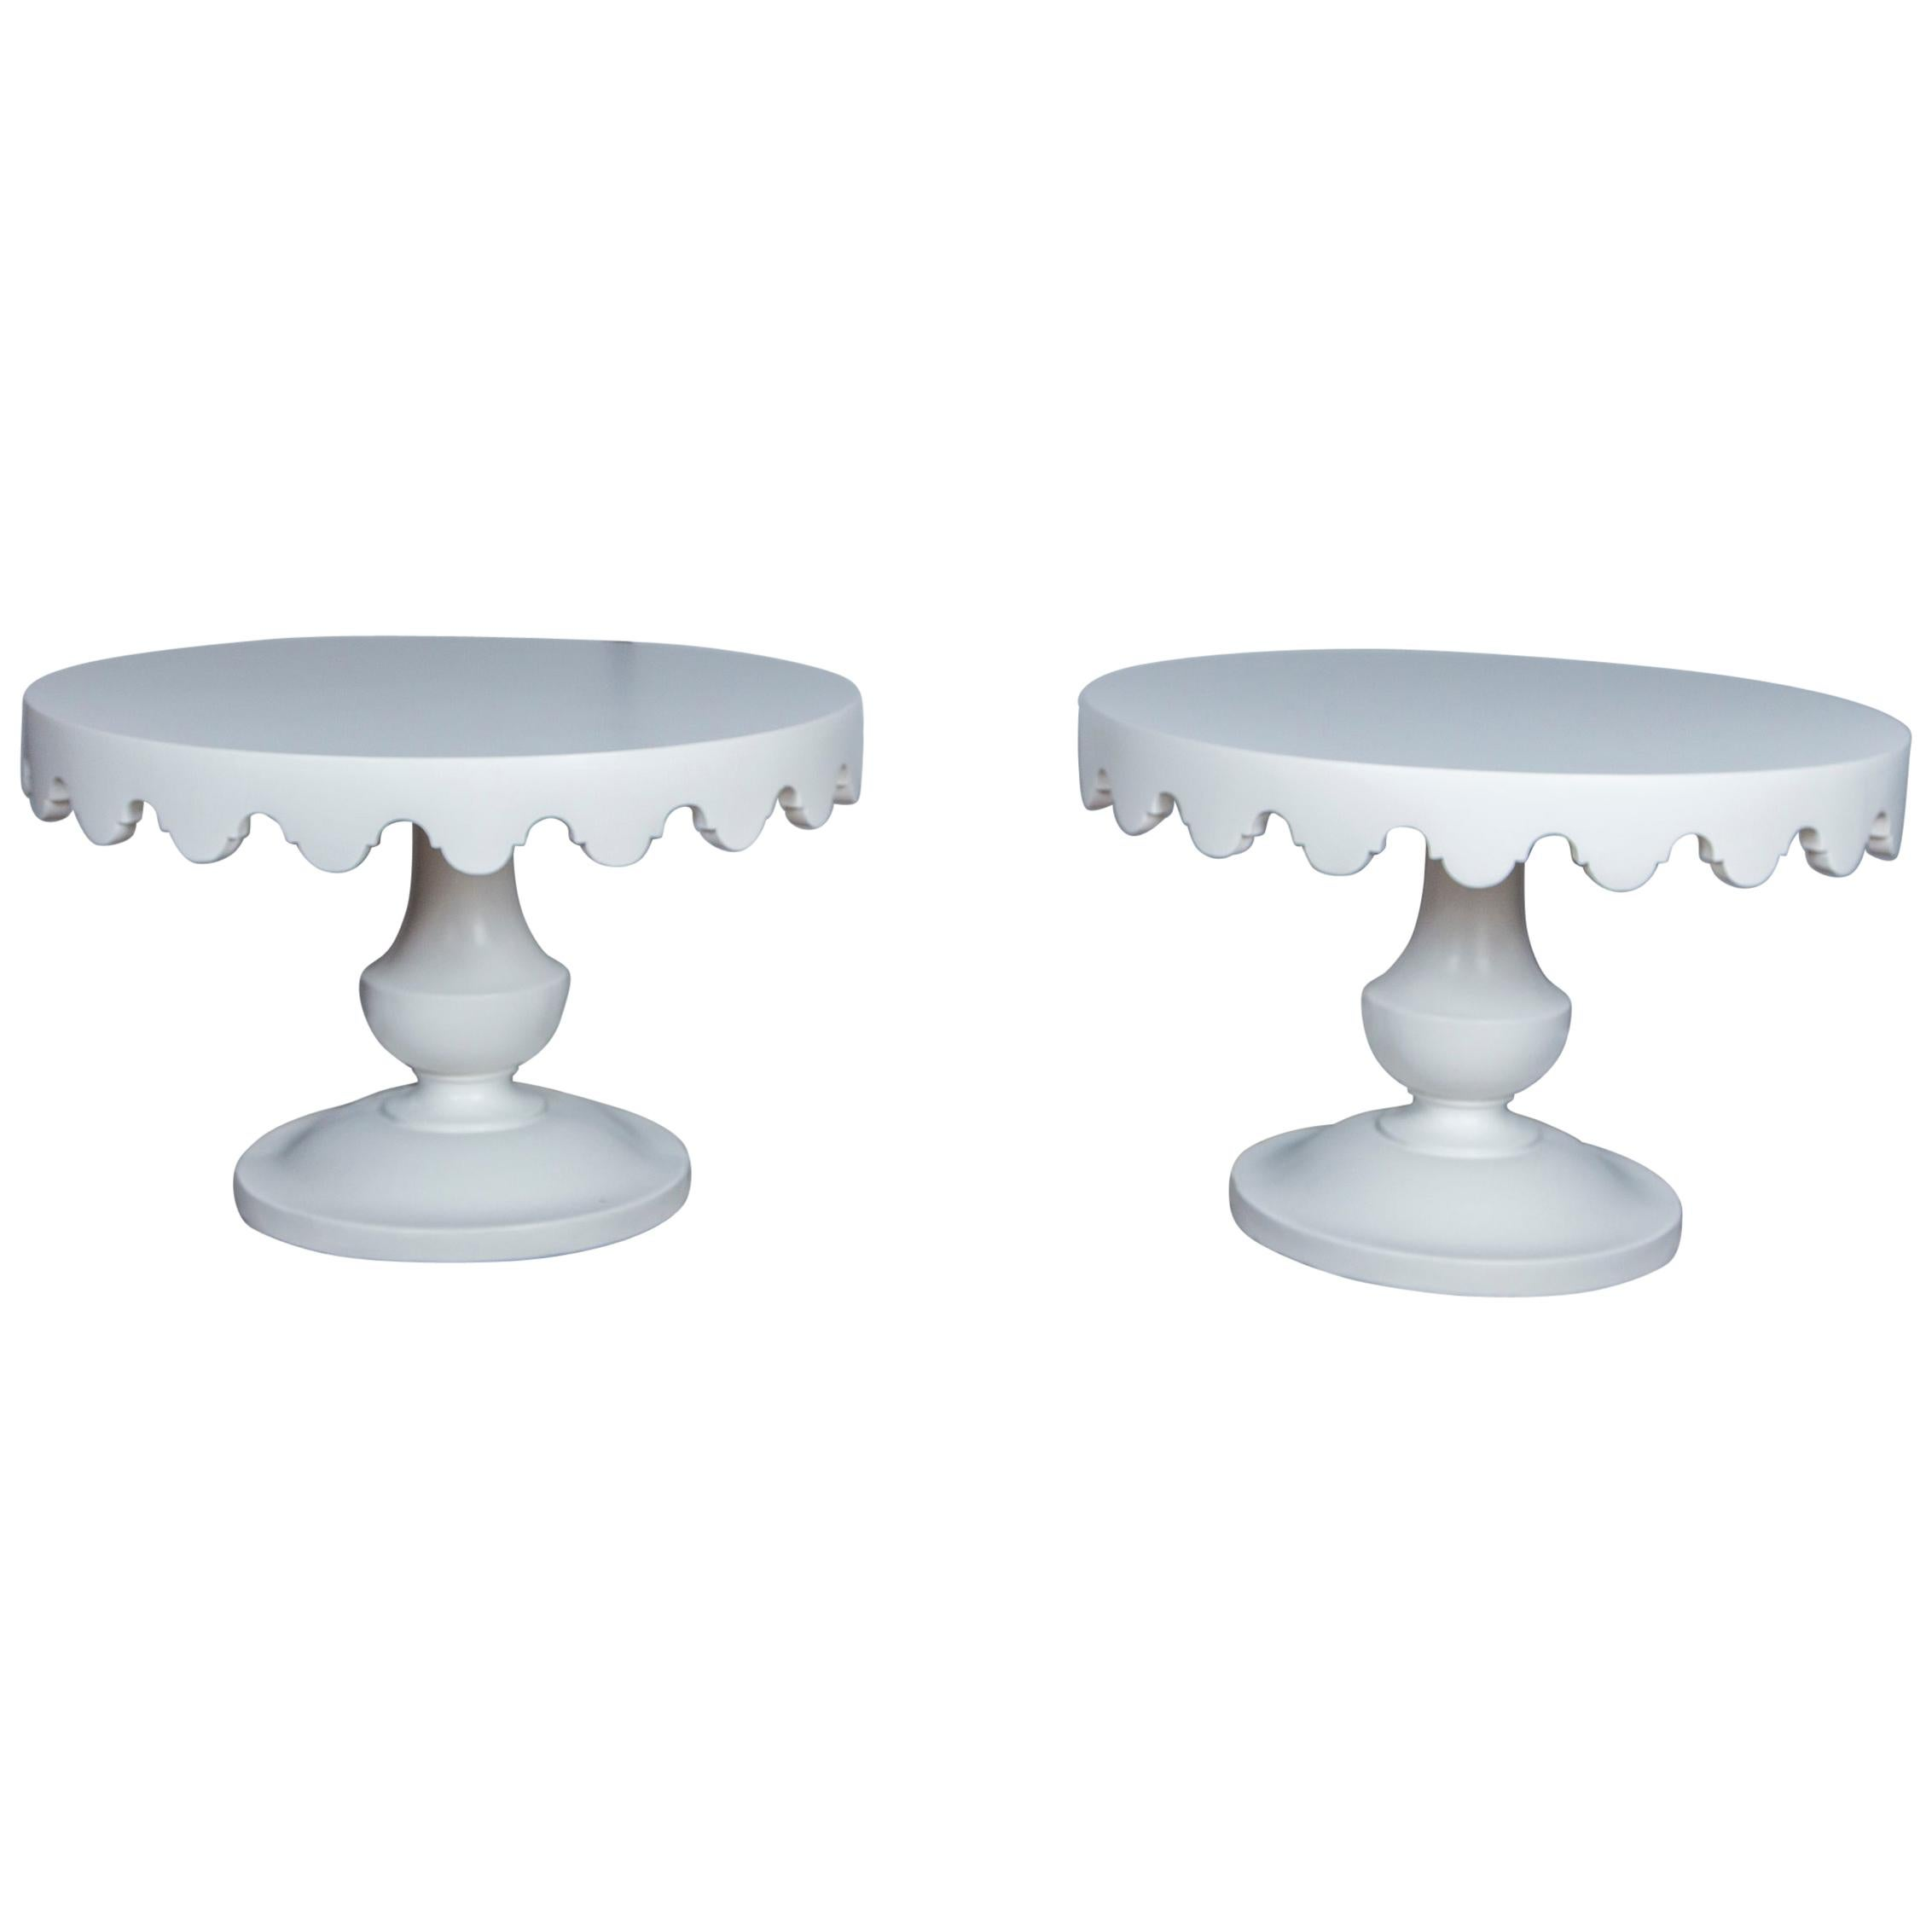 Pair of Original Handmade Dorothy Draper Tables for the Greenbrier Resort